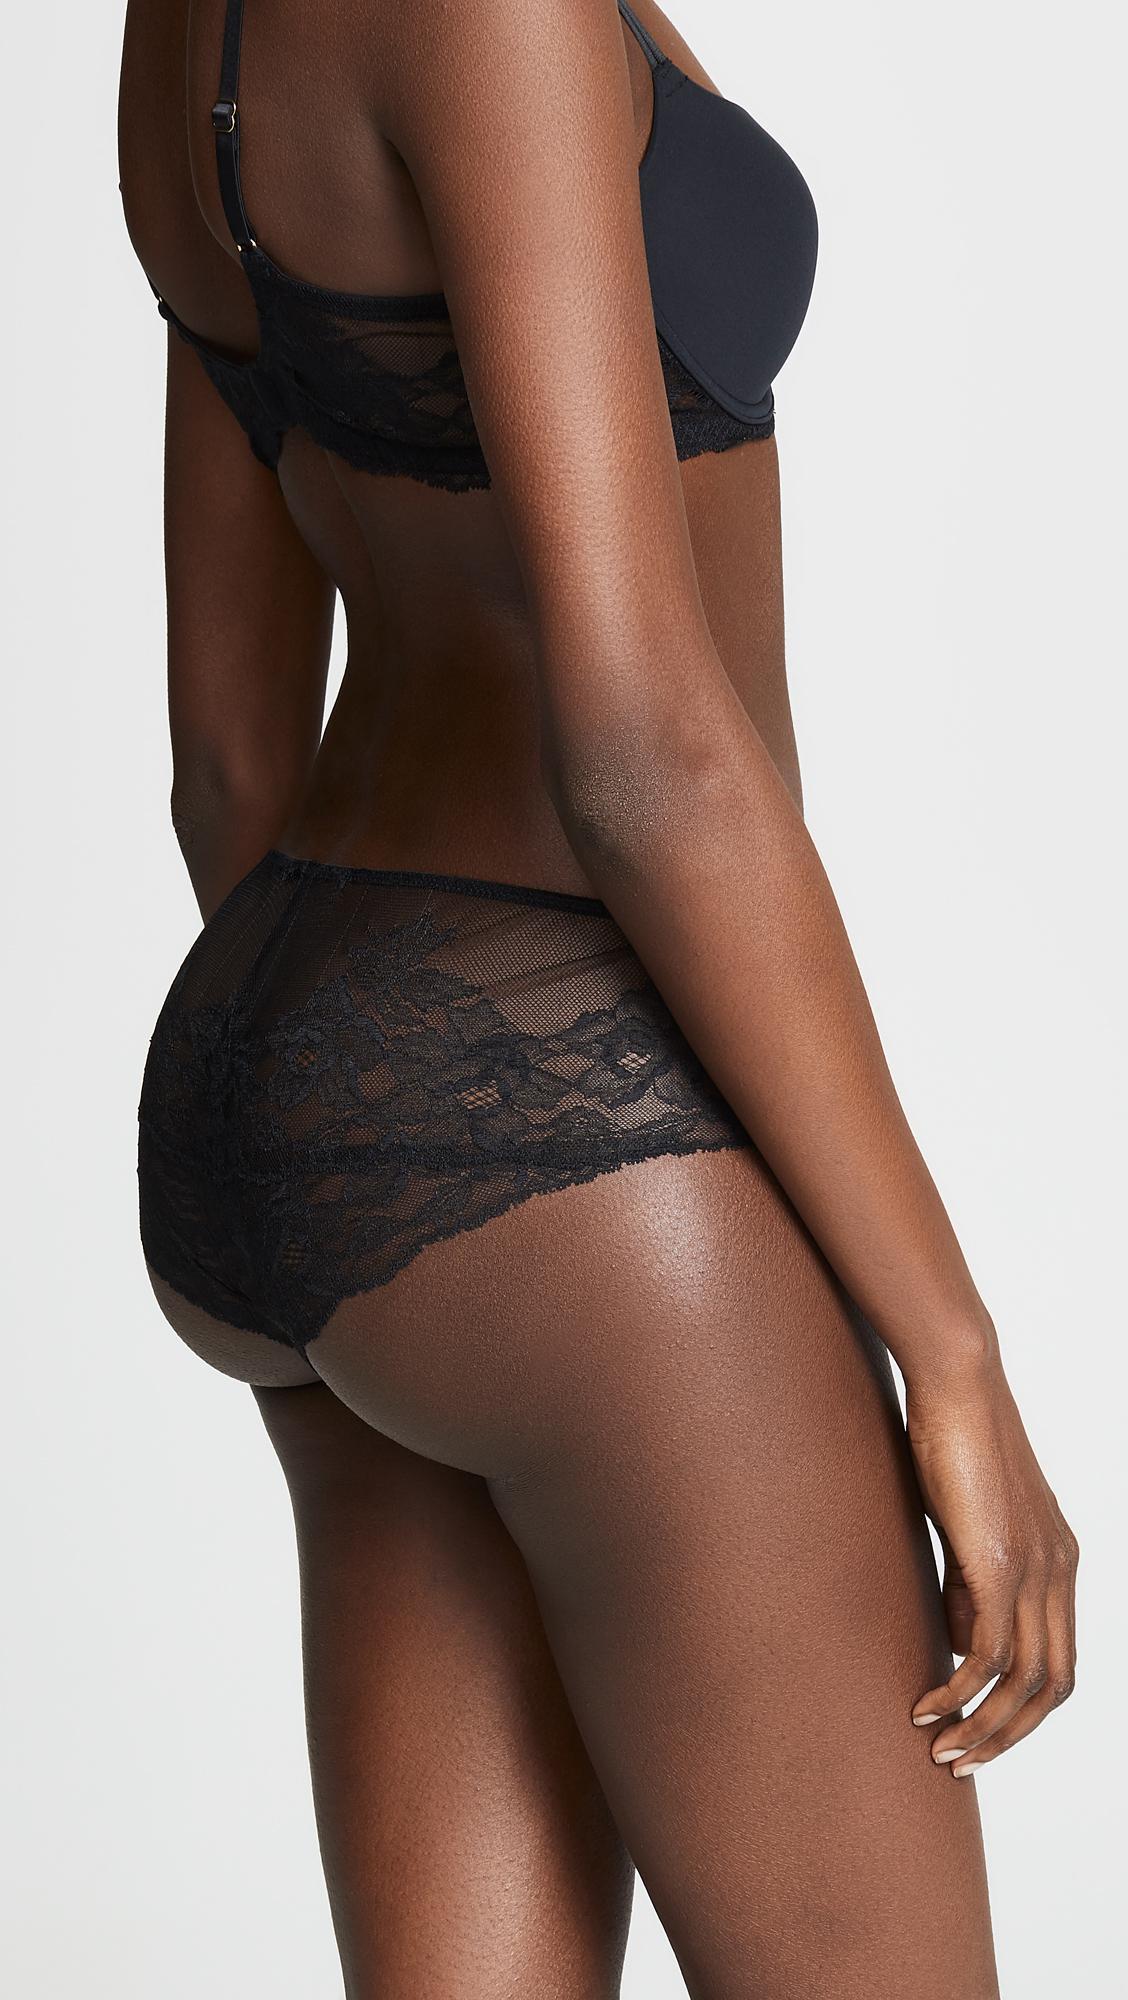 47a49d4a0d74c Lyst - Natori Delight Tanga Panties in Black